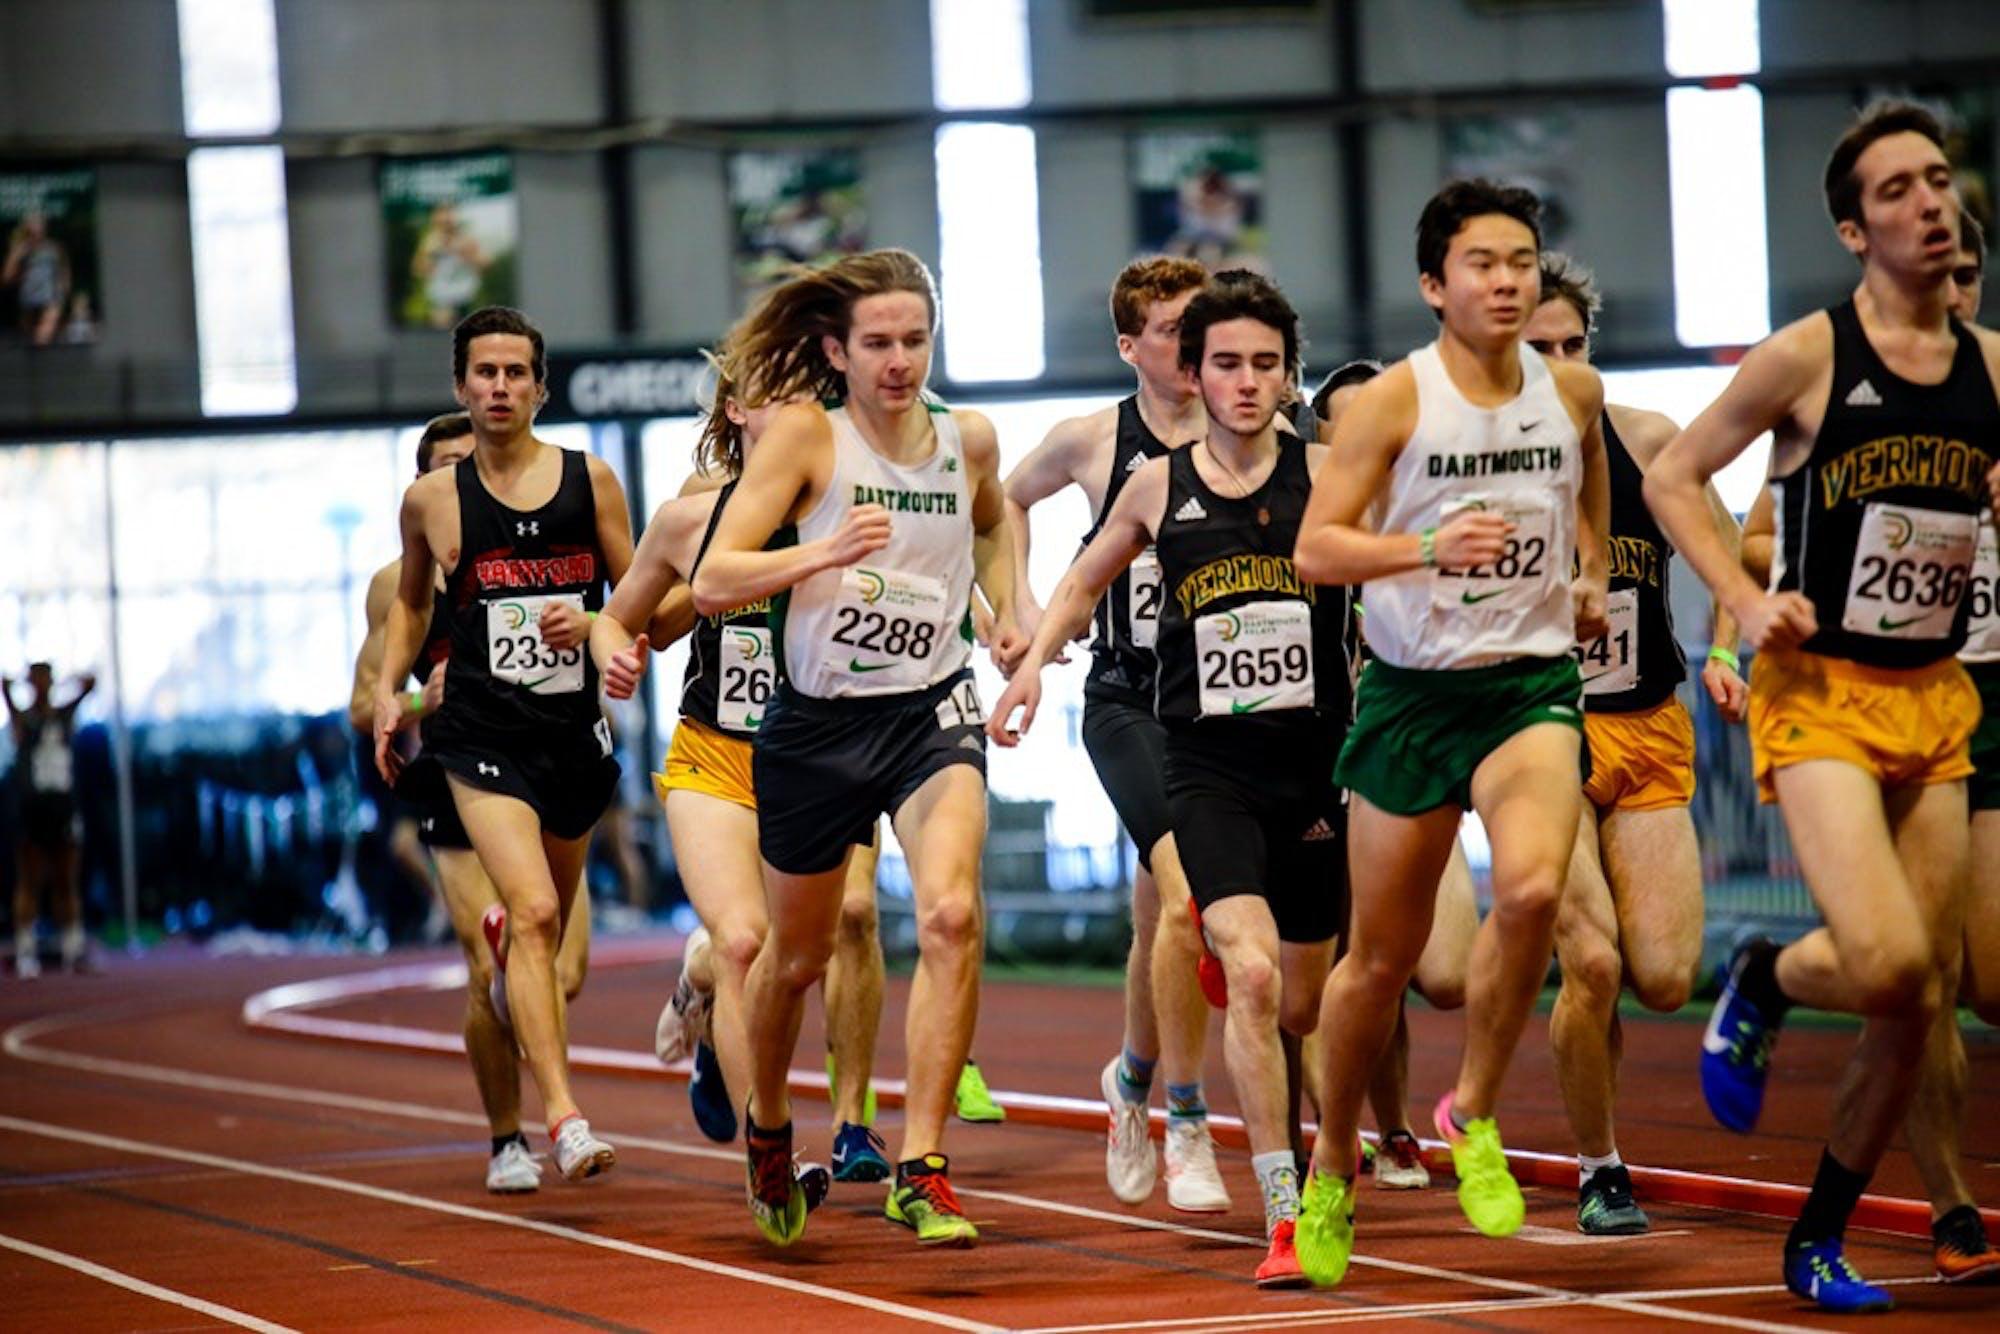 2-25-19-track1-michaellin